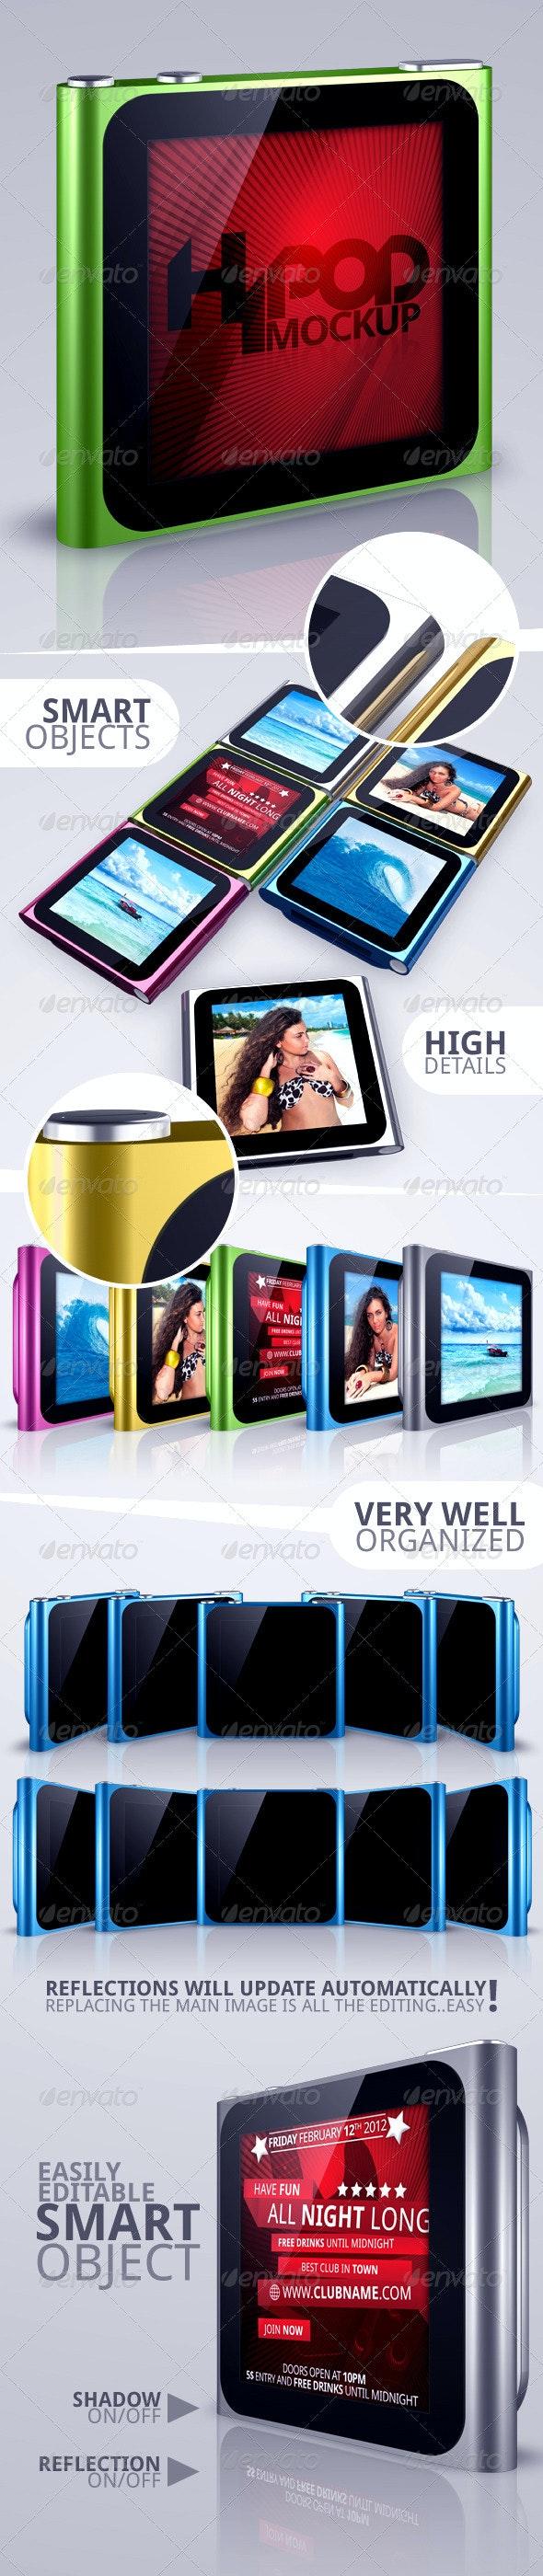 HiPod Nano Mock-Up - Miscellaneous Displays